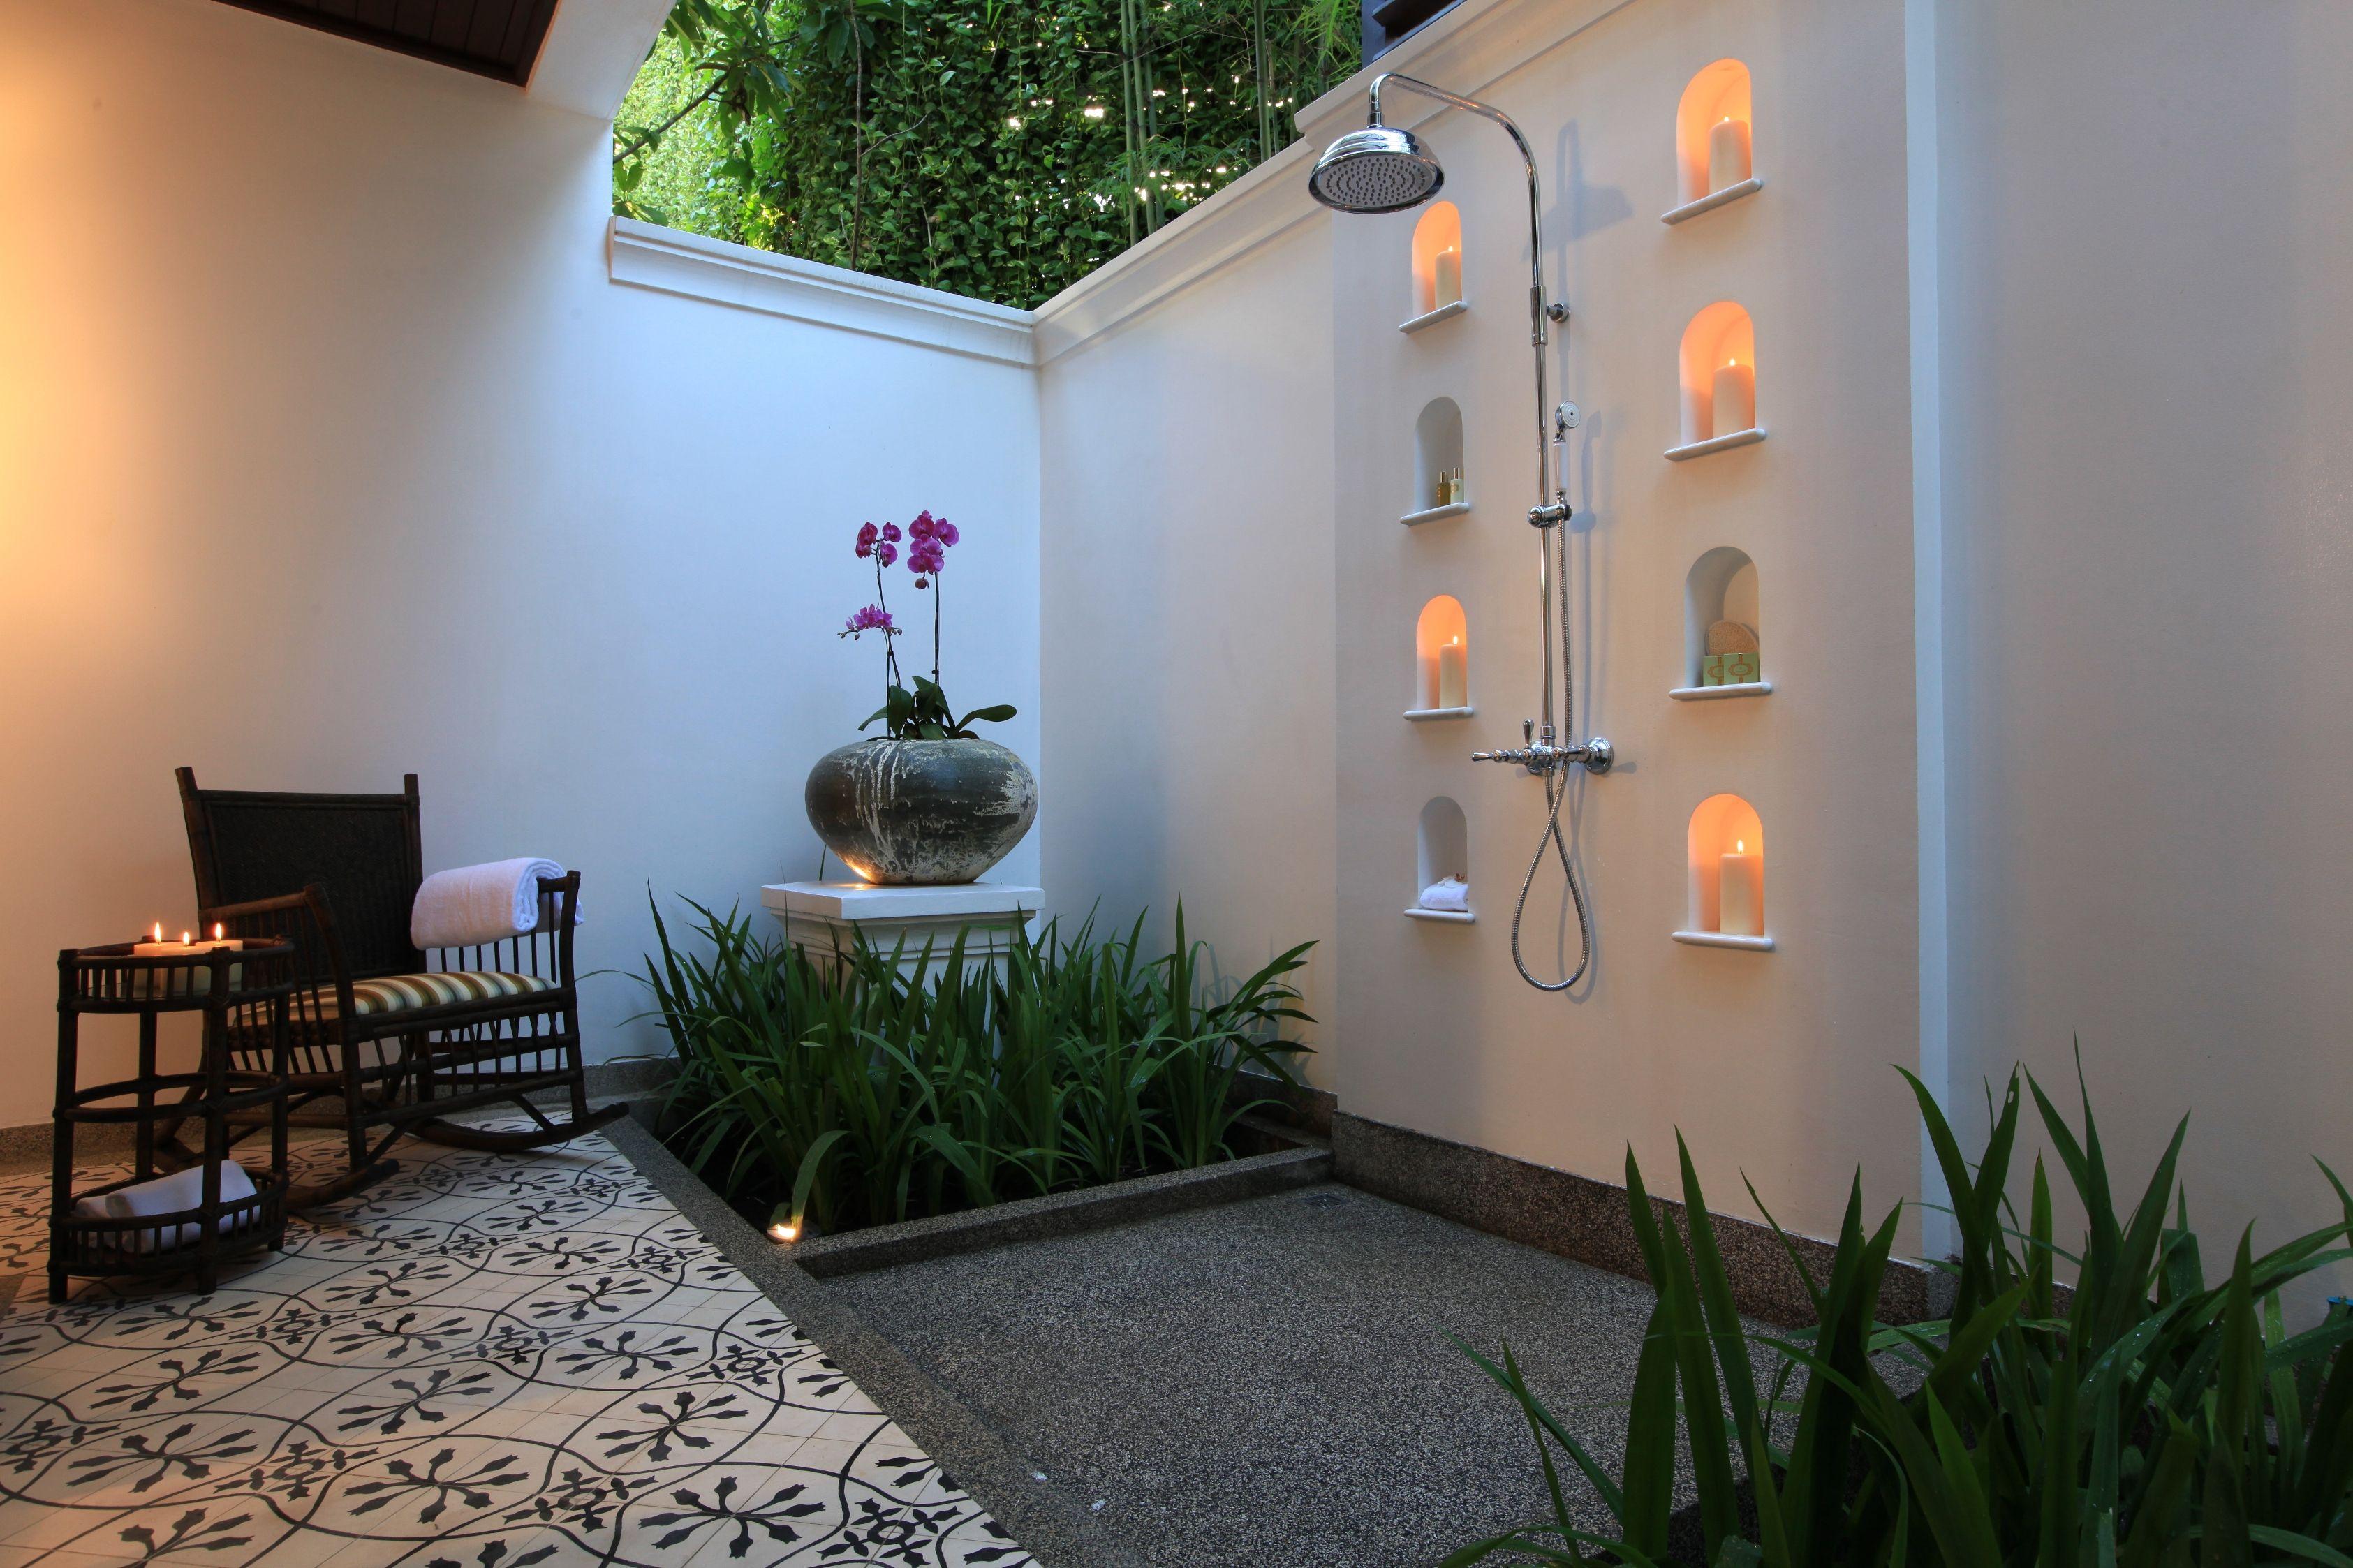 Pineneida Moreira On Area Externa  Pinterest Fair Luxury Outdoor Bathrooms Design Inspiration